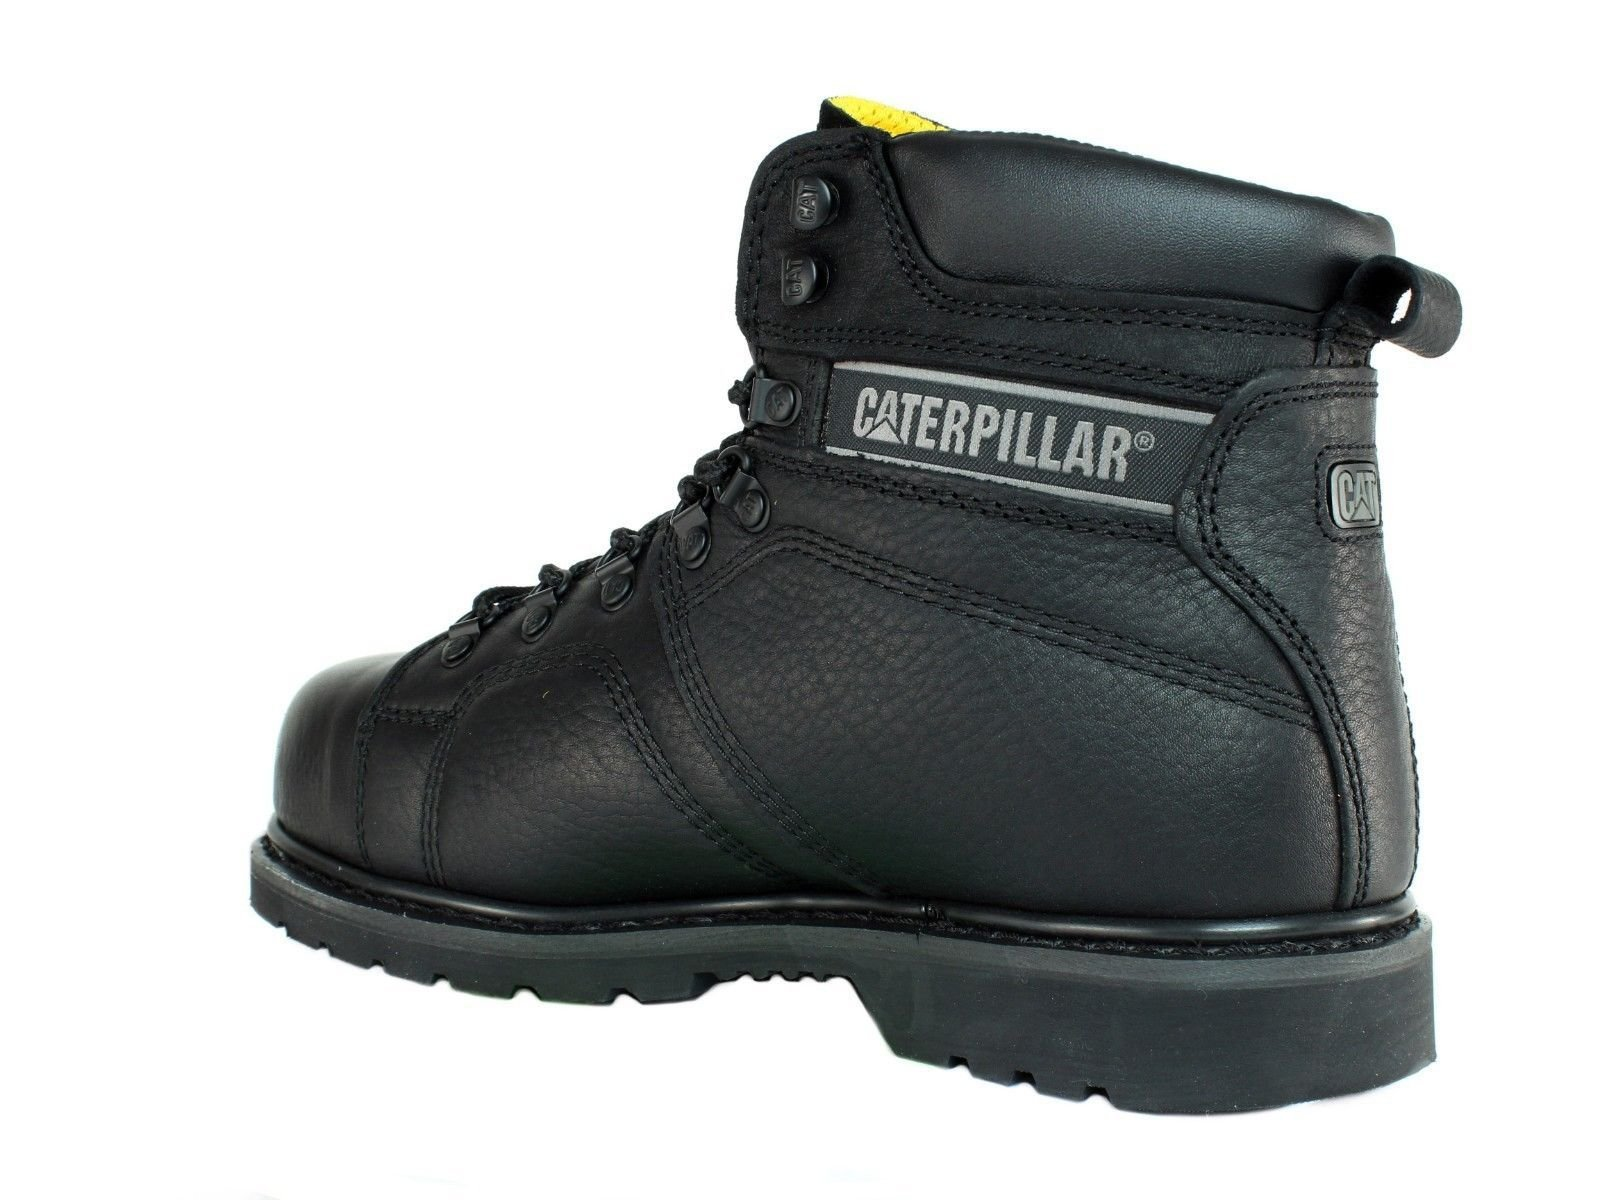 Caterpillar SureGrip Mens Silverton SG Black Slip Resistant Work Boots 12M by Caterpillar (Image #5)